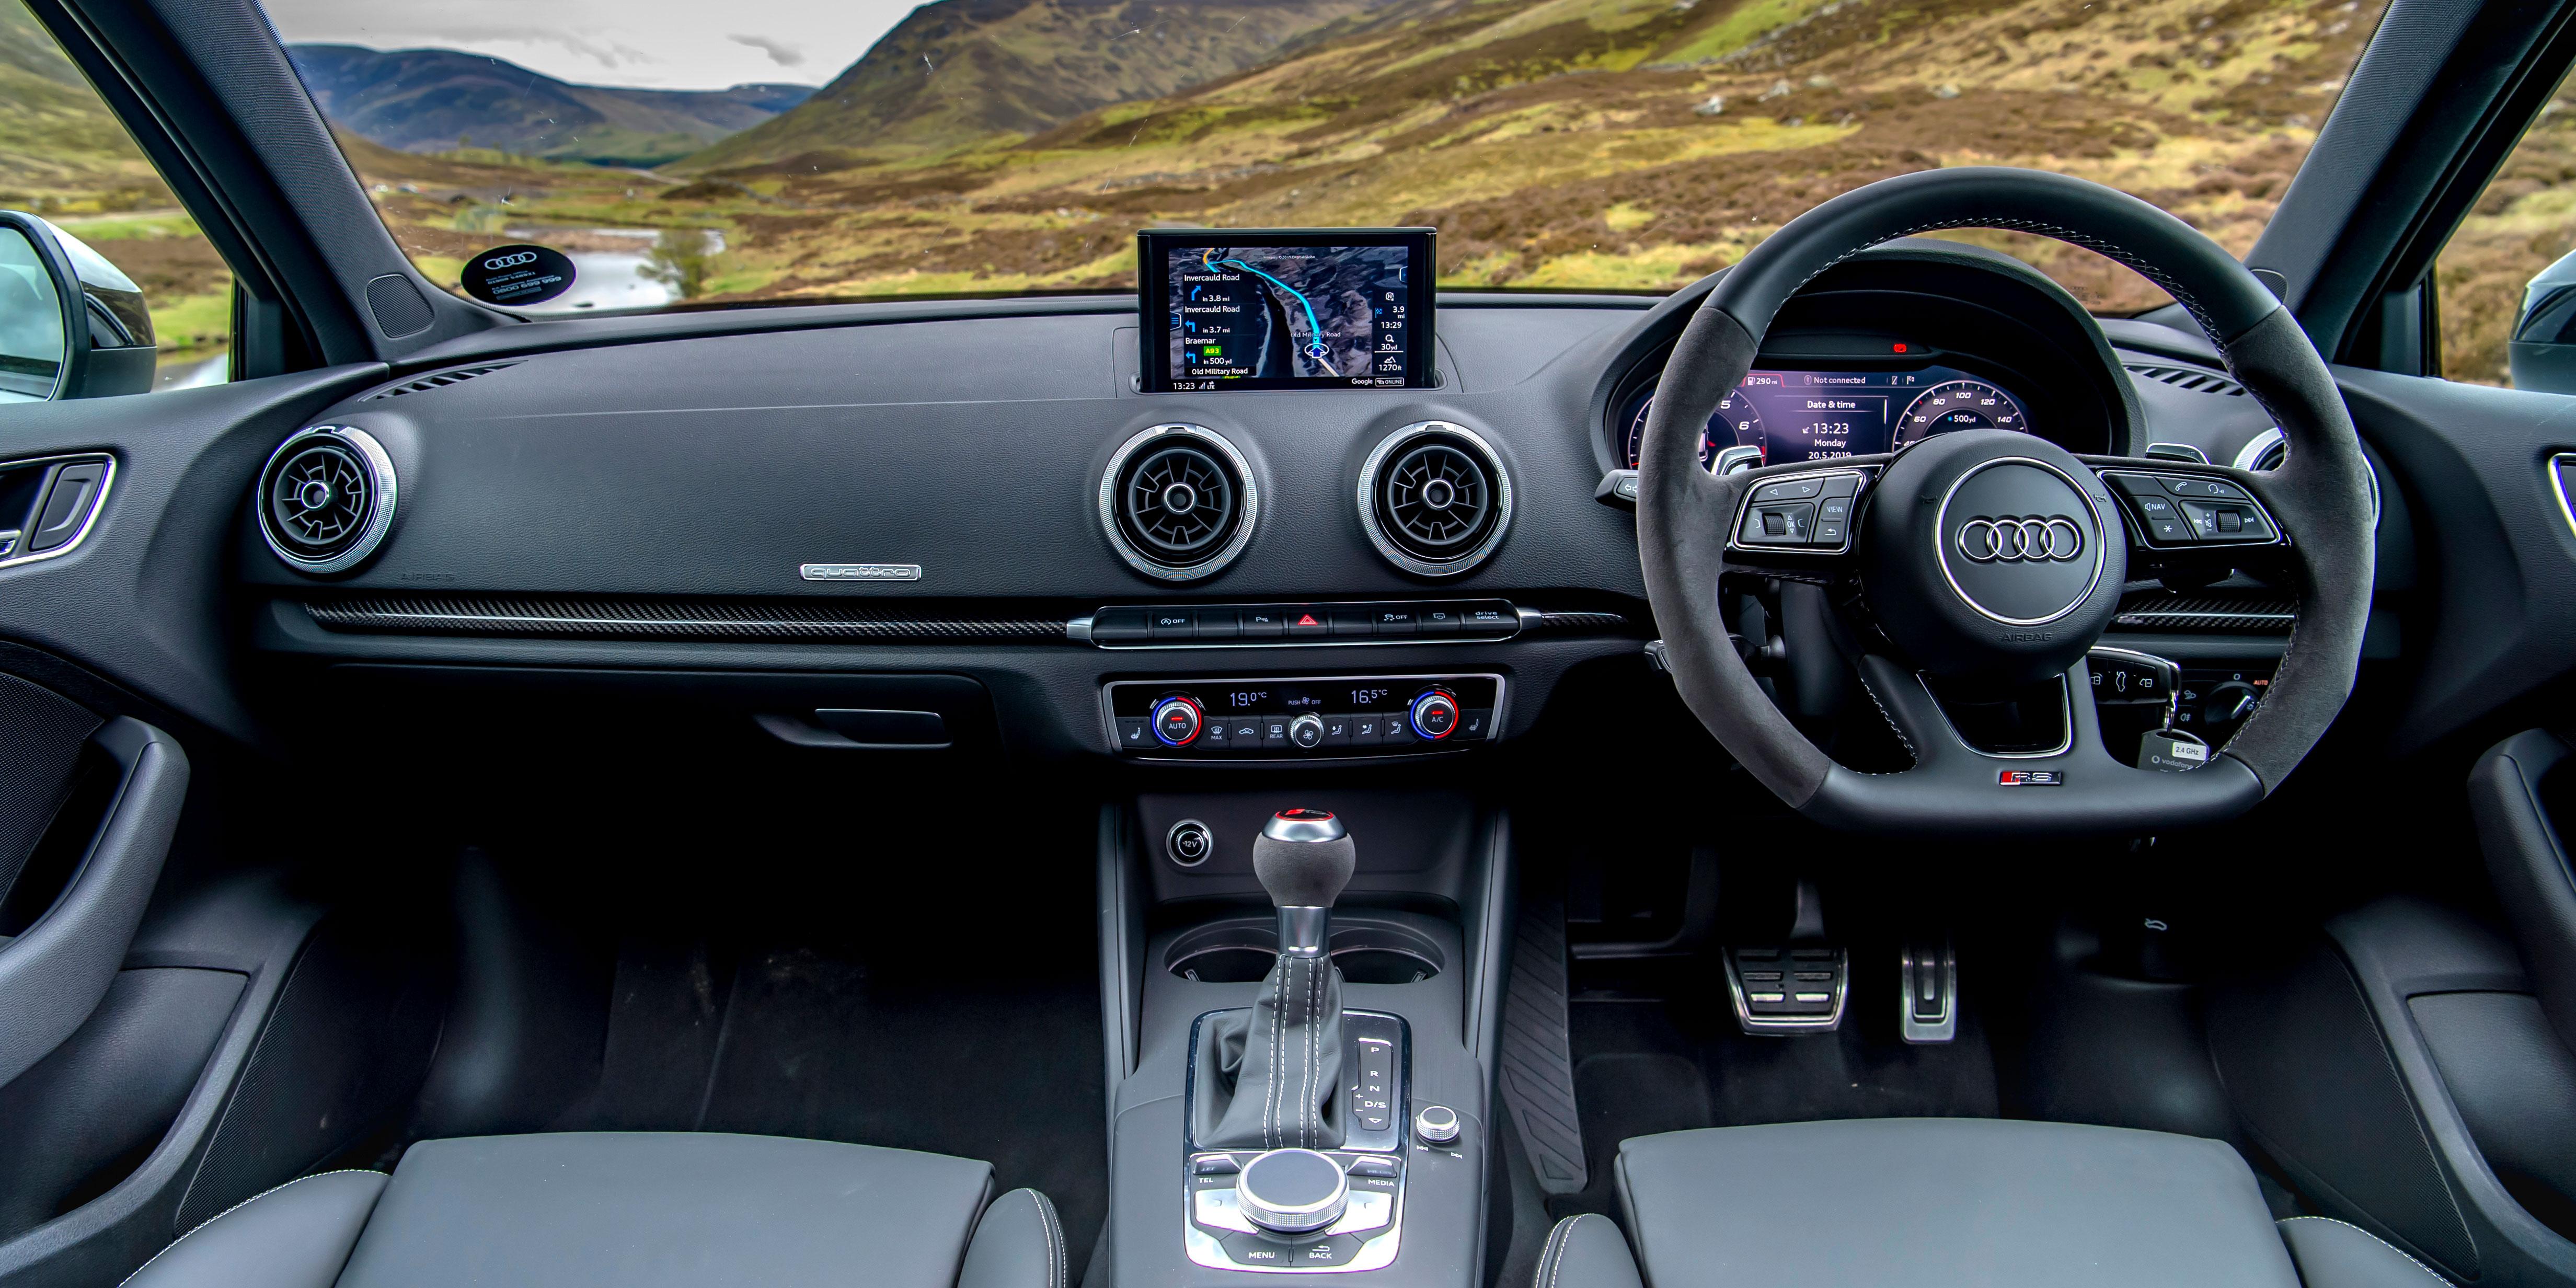 Kelebihan Kekurangan Audi Rs3 Sportback Murah Berkualitas